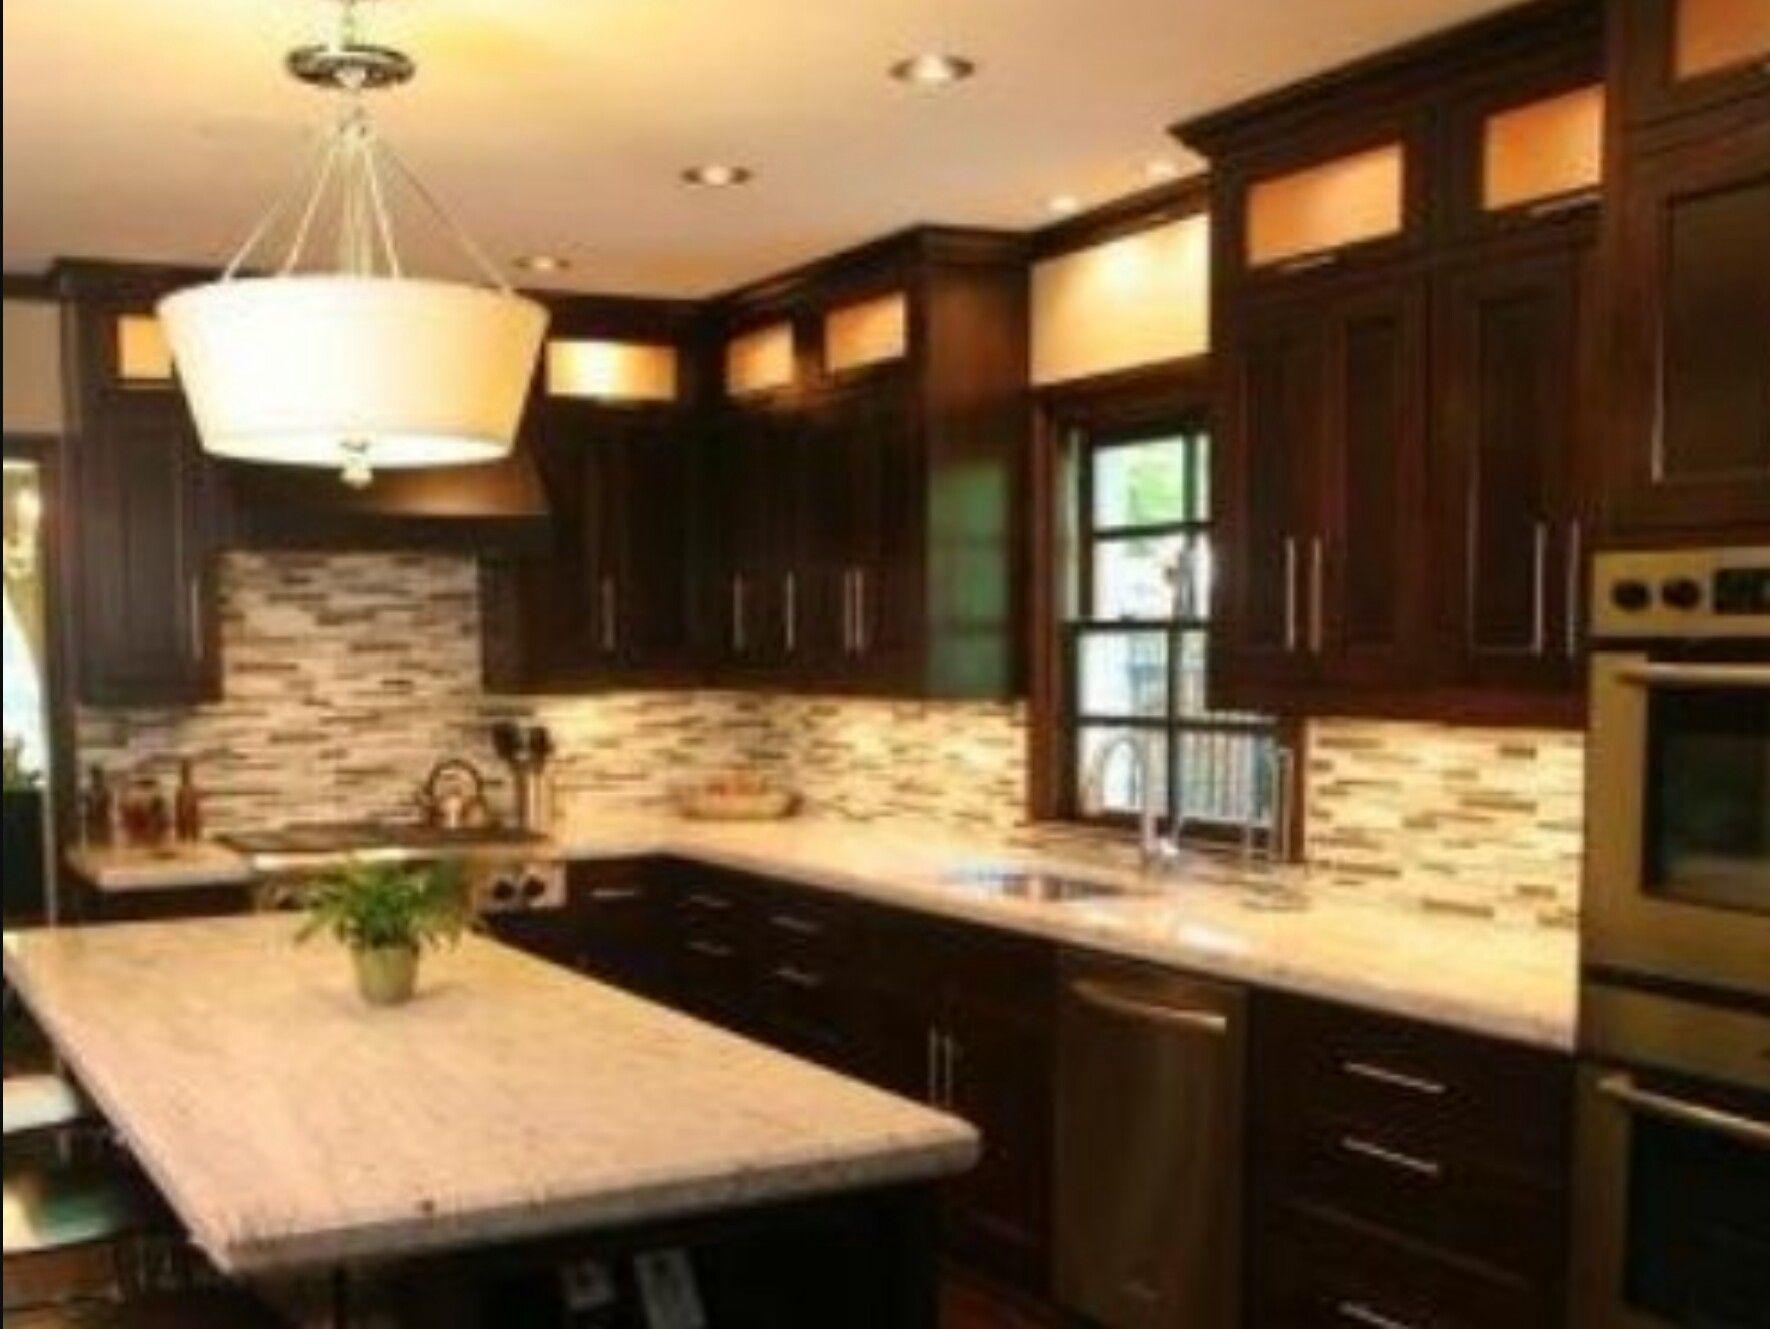 Kitchen Kitchen Ideas for the house